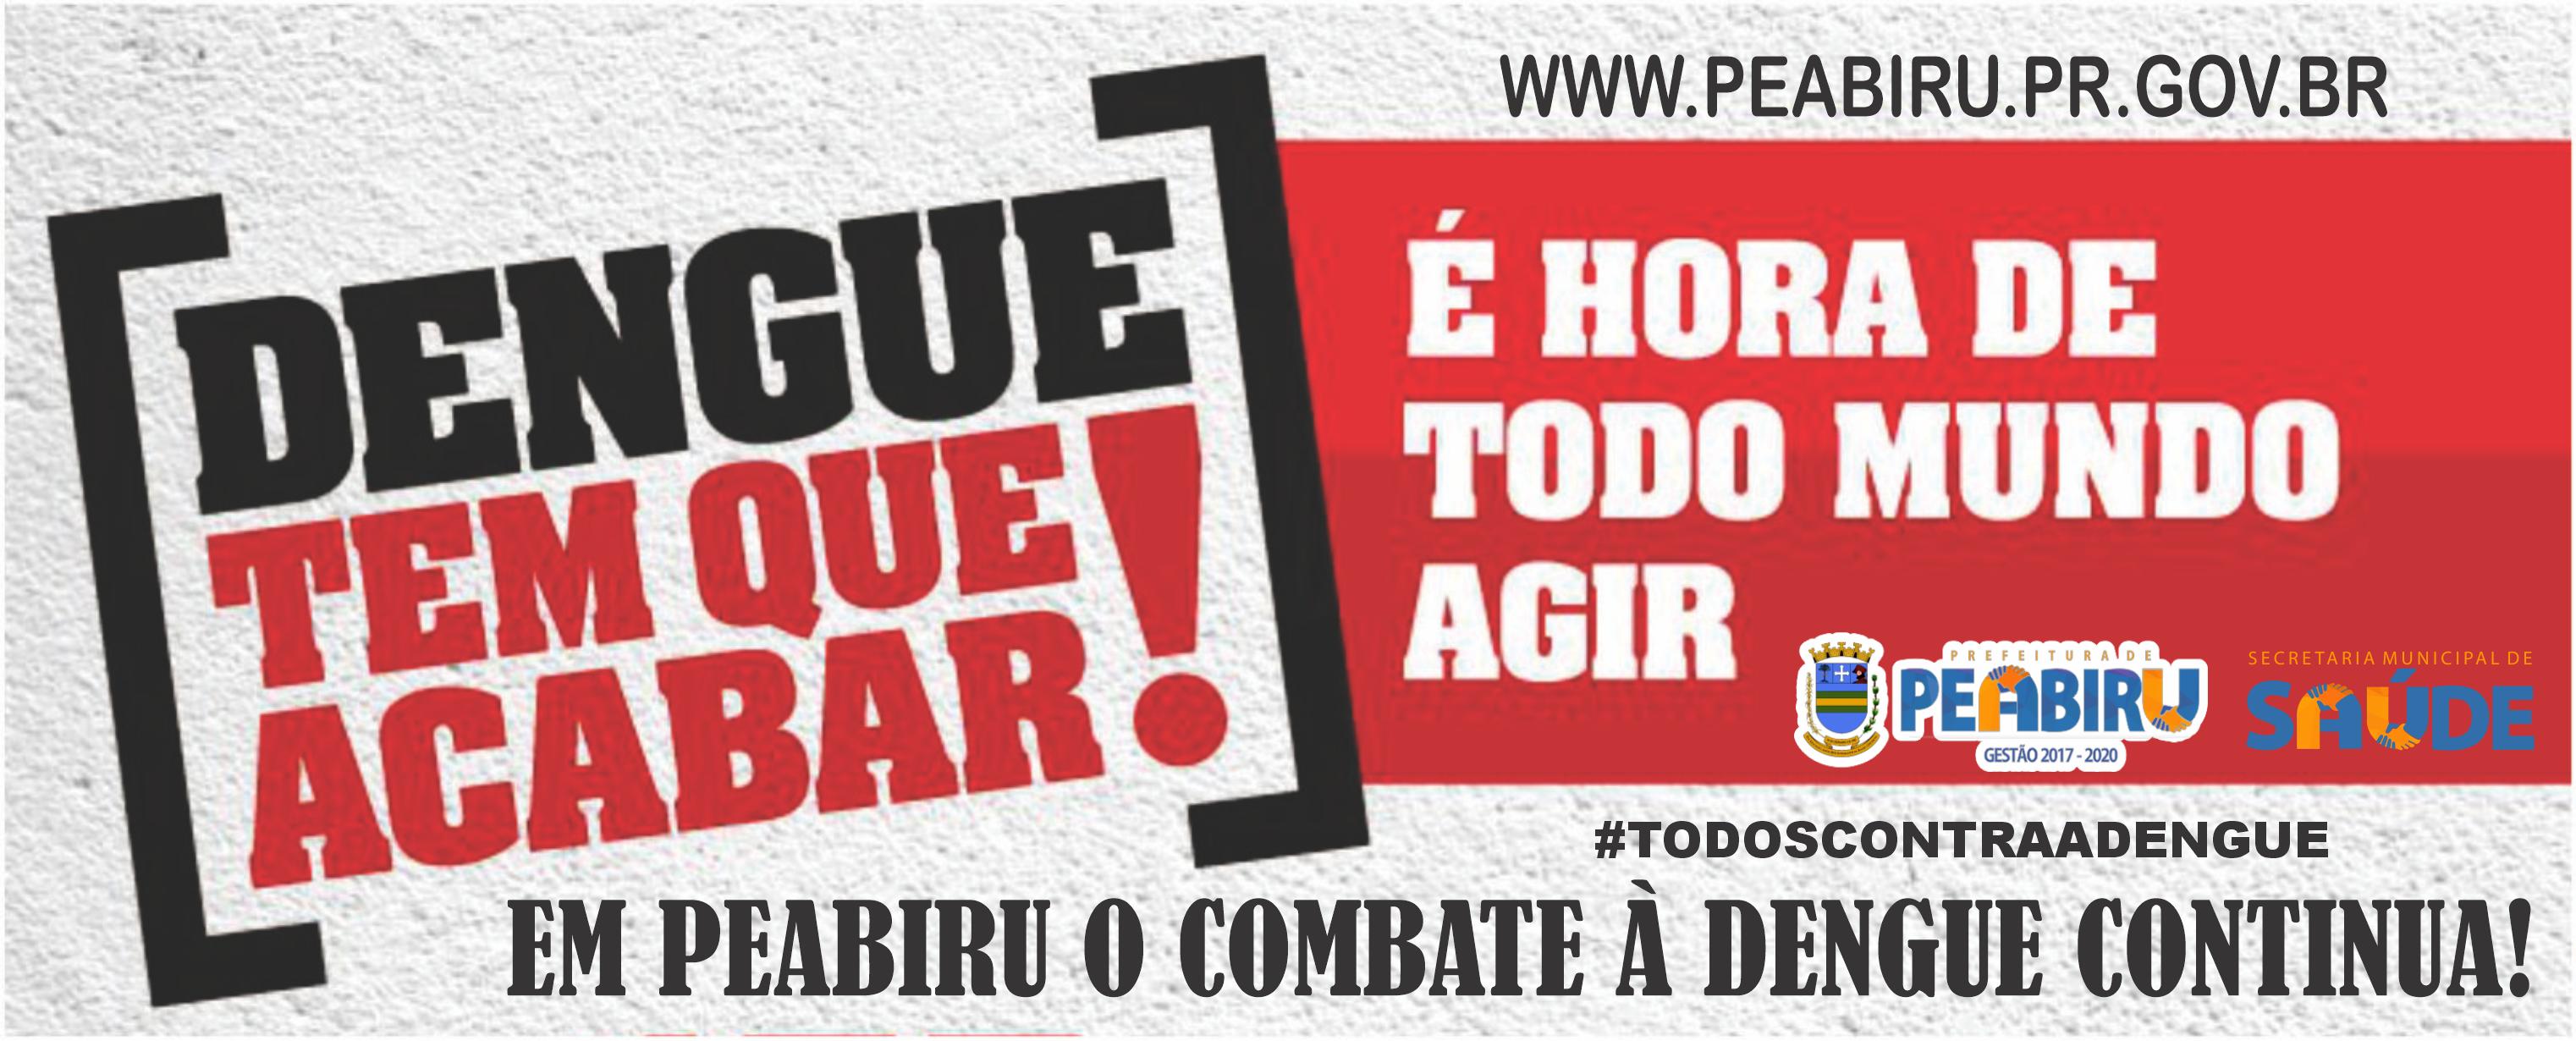 PEABIRU CONTINUA CONTRA NO COMBATE À DENGUE